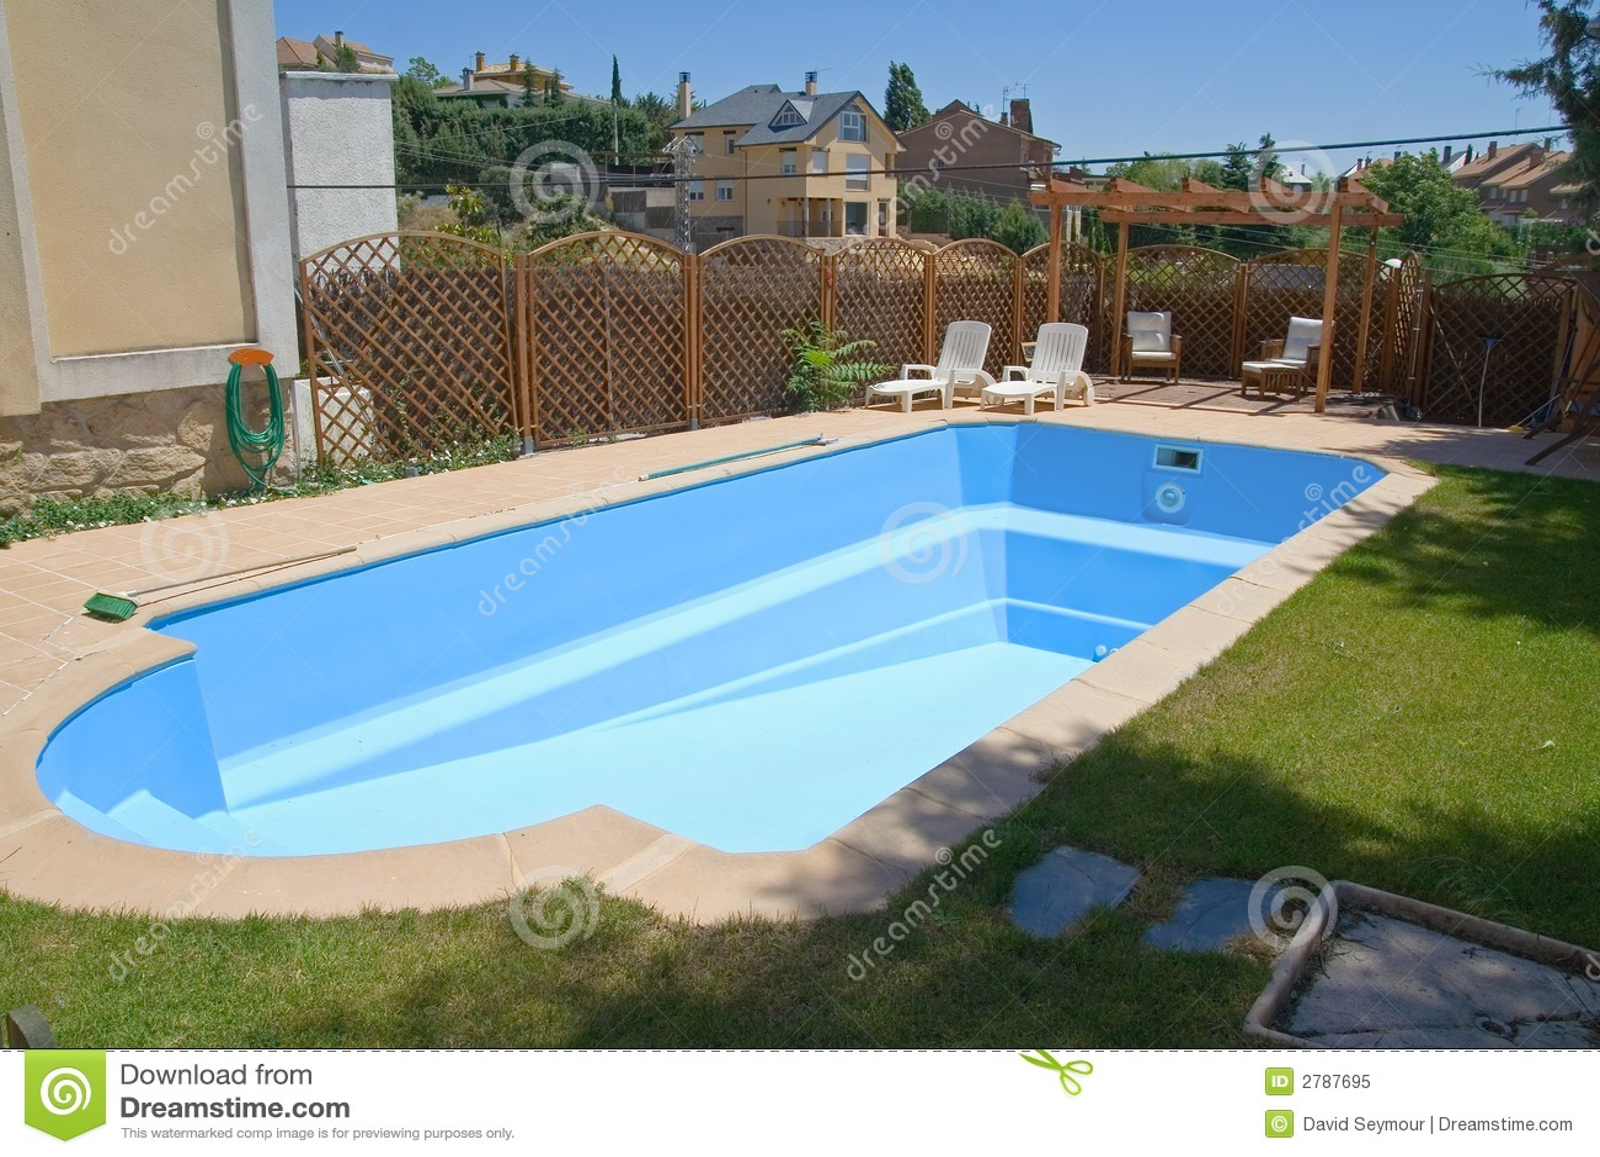 Piscine da giardino prezzi nuova piscina in un giardino for Piscina in un giardino piccolo